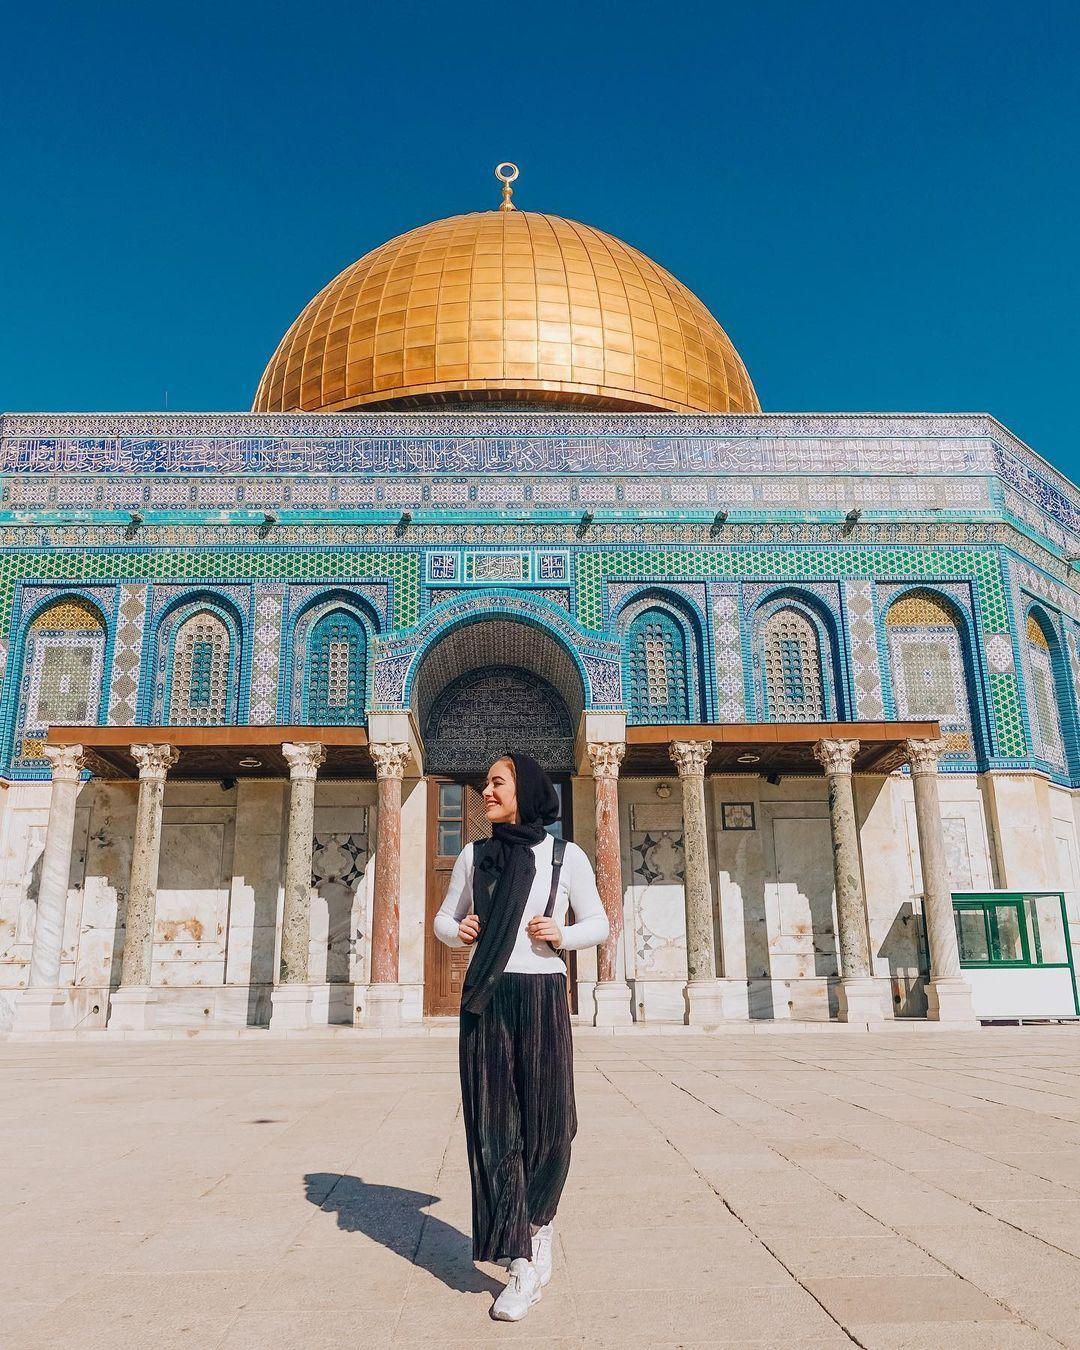 Dome of the Rock, Temple Mount, Al-Aqsa Mosque, Jerusalem | Sabina Trojanova | Instagram